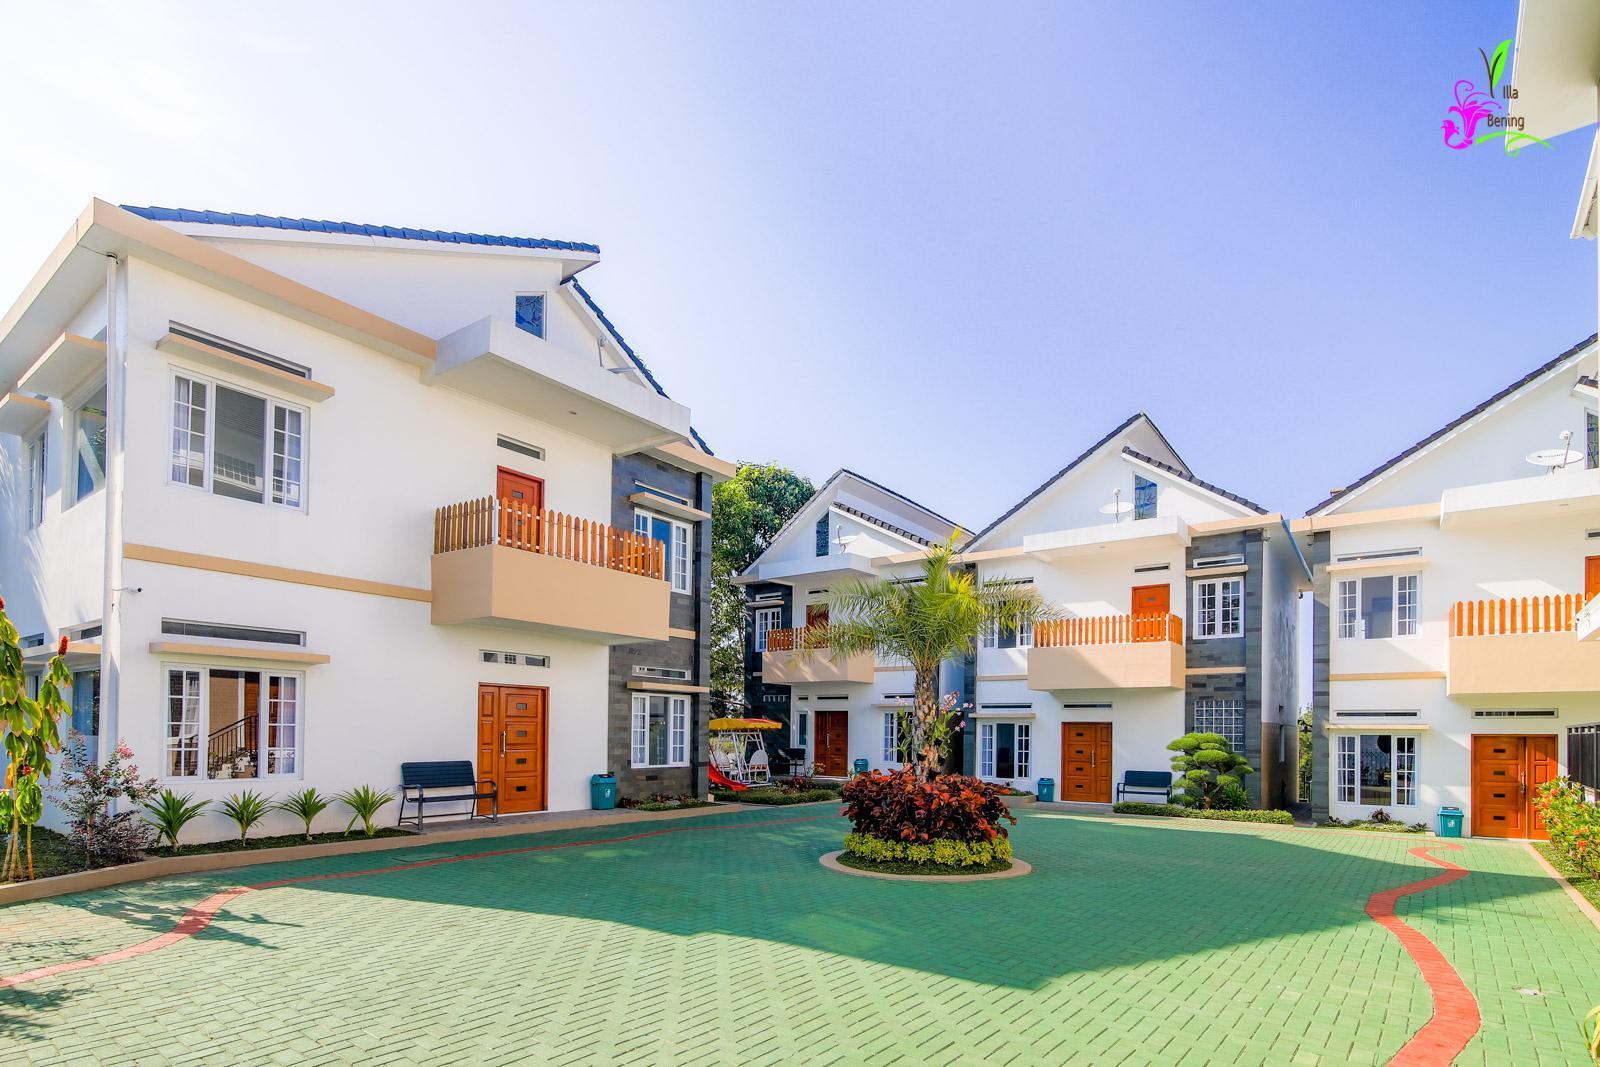 Villa Bening Blok 3